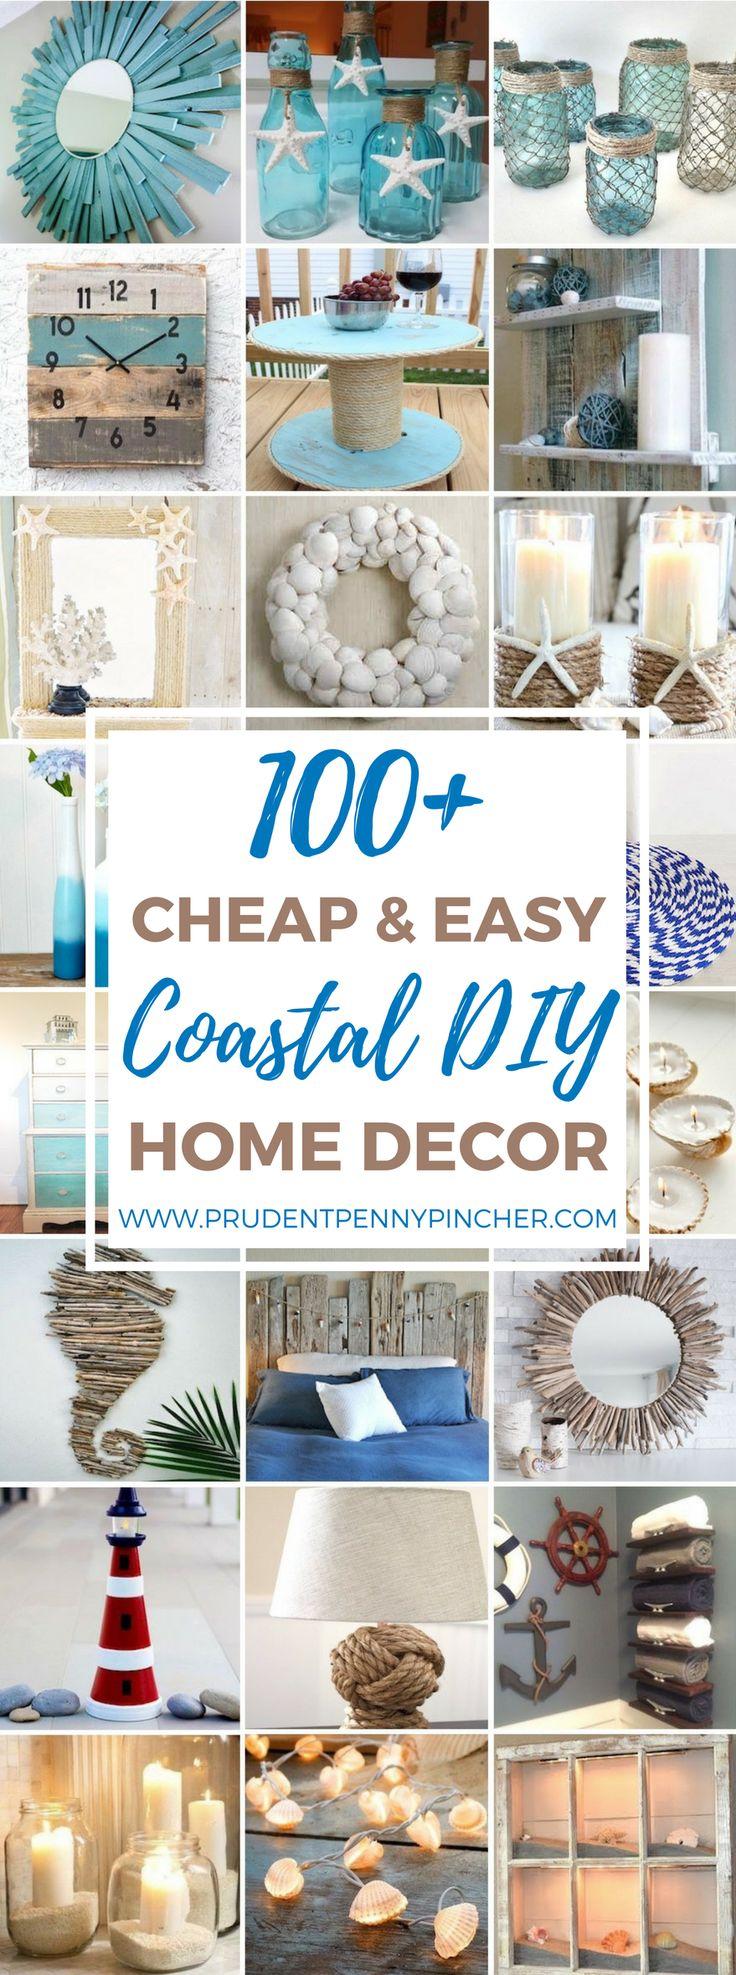 100 Cheap and Easy Coastal DIY Home Decor Ideas